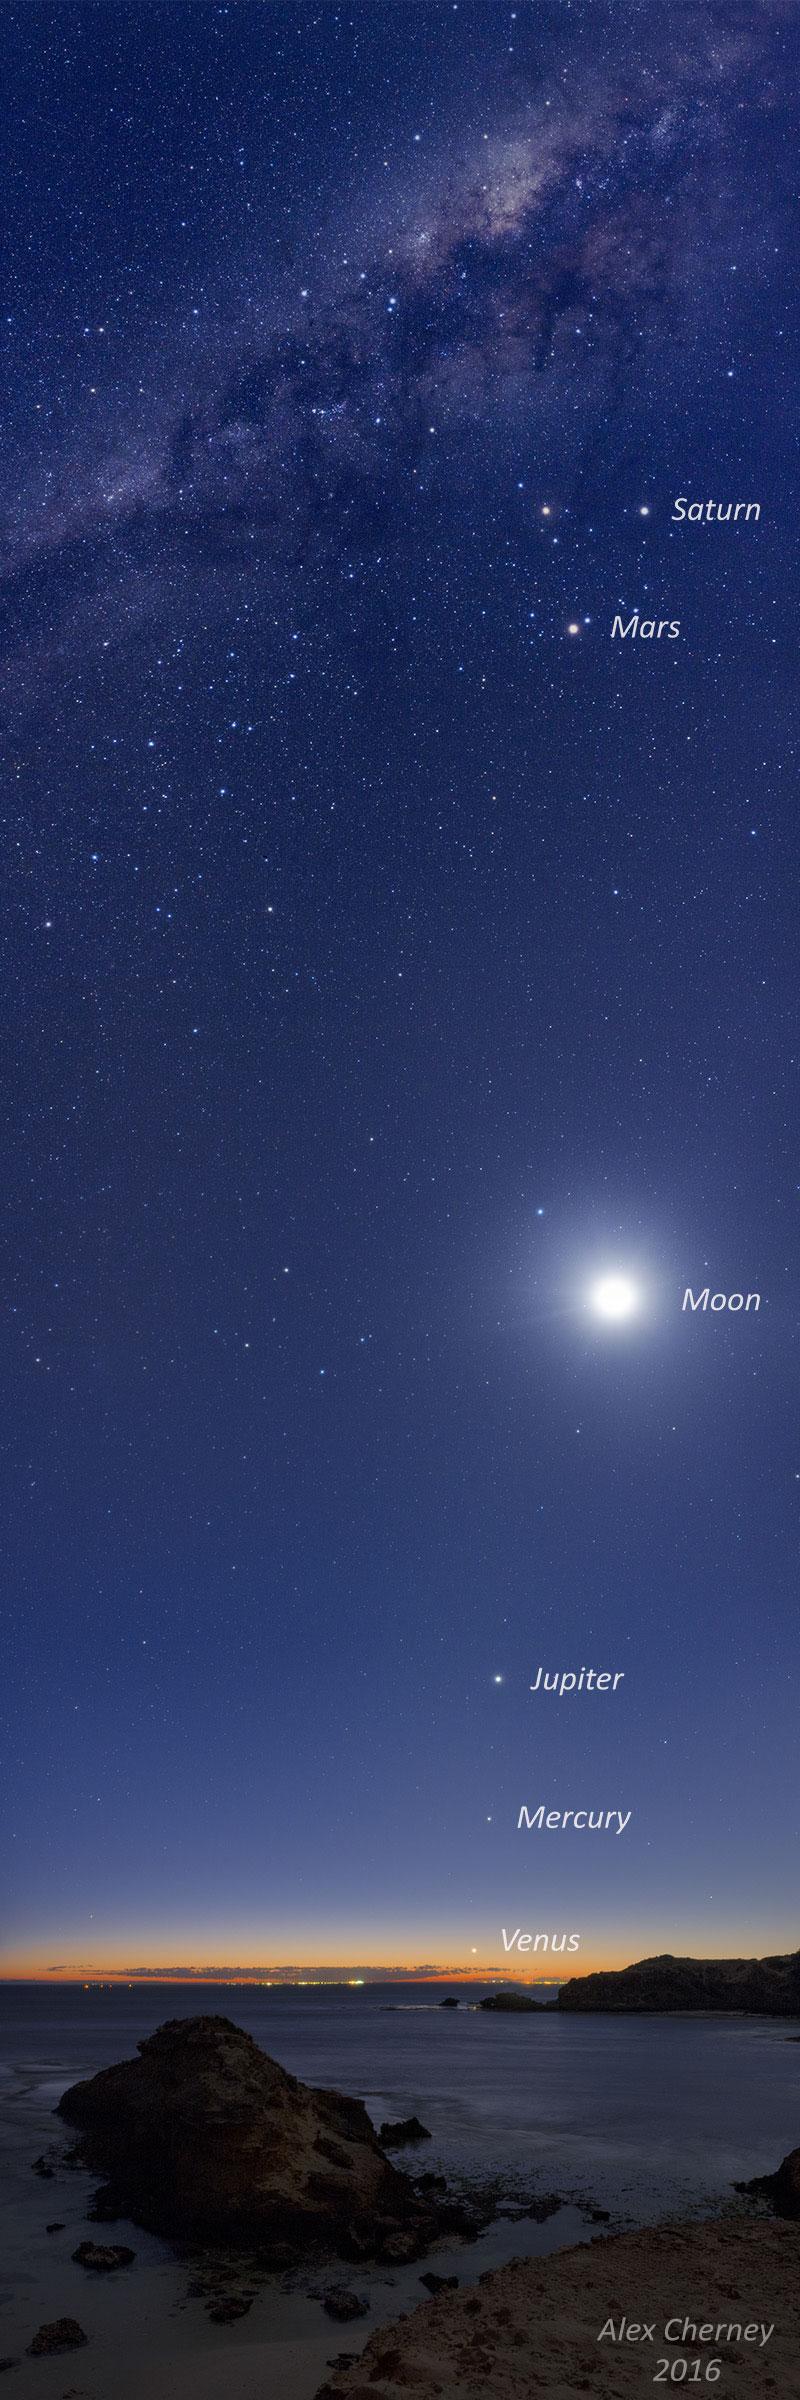 http://apod.nasa.gov/apod/image/1608/Planets_Cherney_800_labeled.jpg